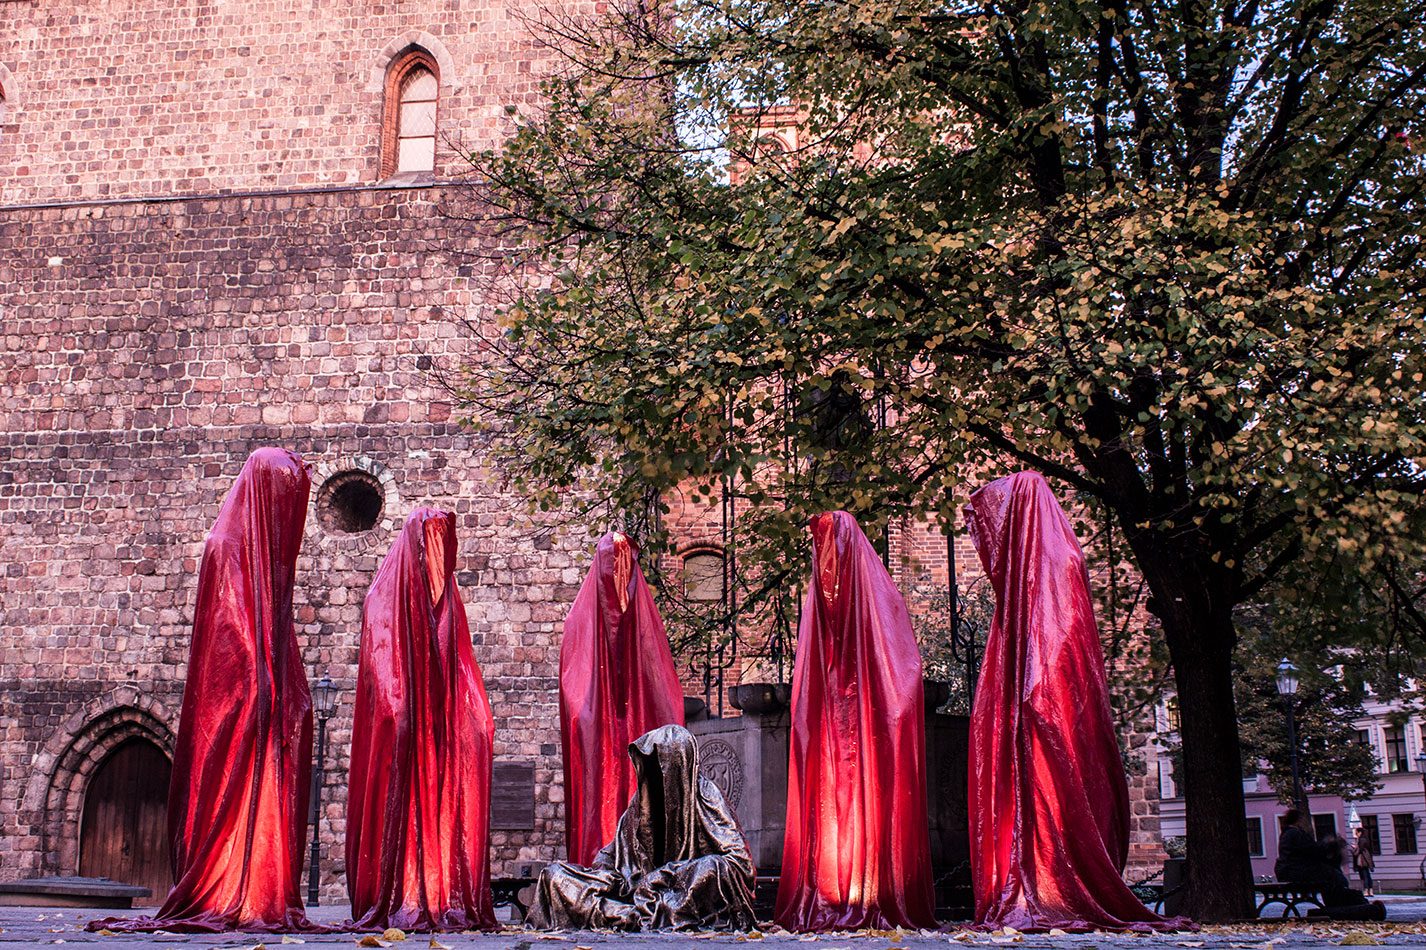 festival-of-lights-berlin-light-art-festival-contemporary-fine-art-design-show-guardiansof-time-manfred-kili-kielnhofer-sculpture-3684